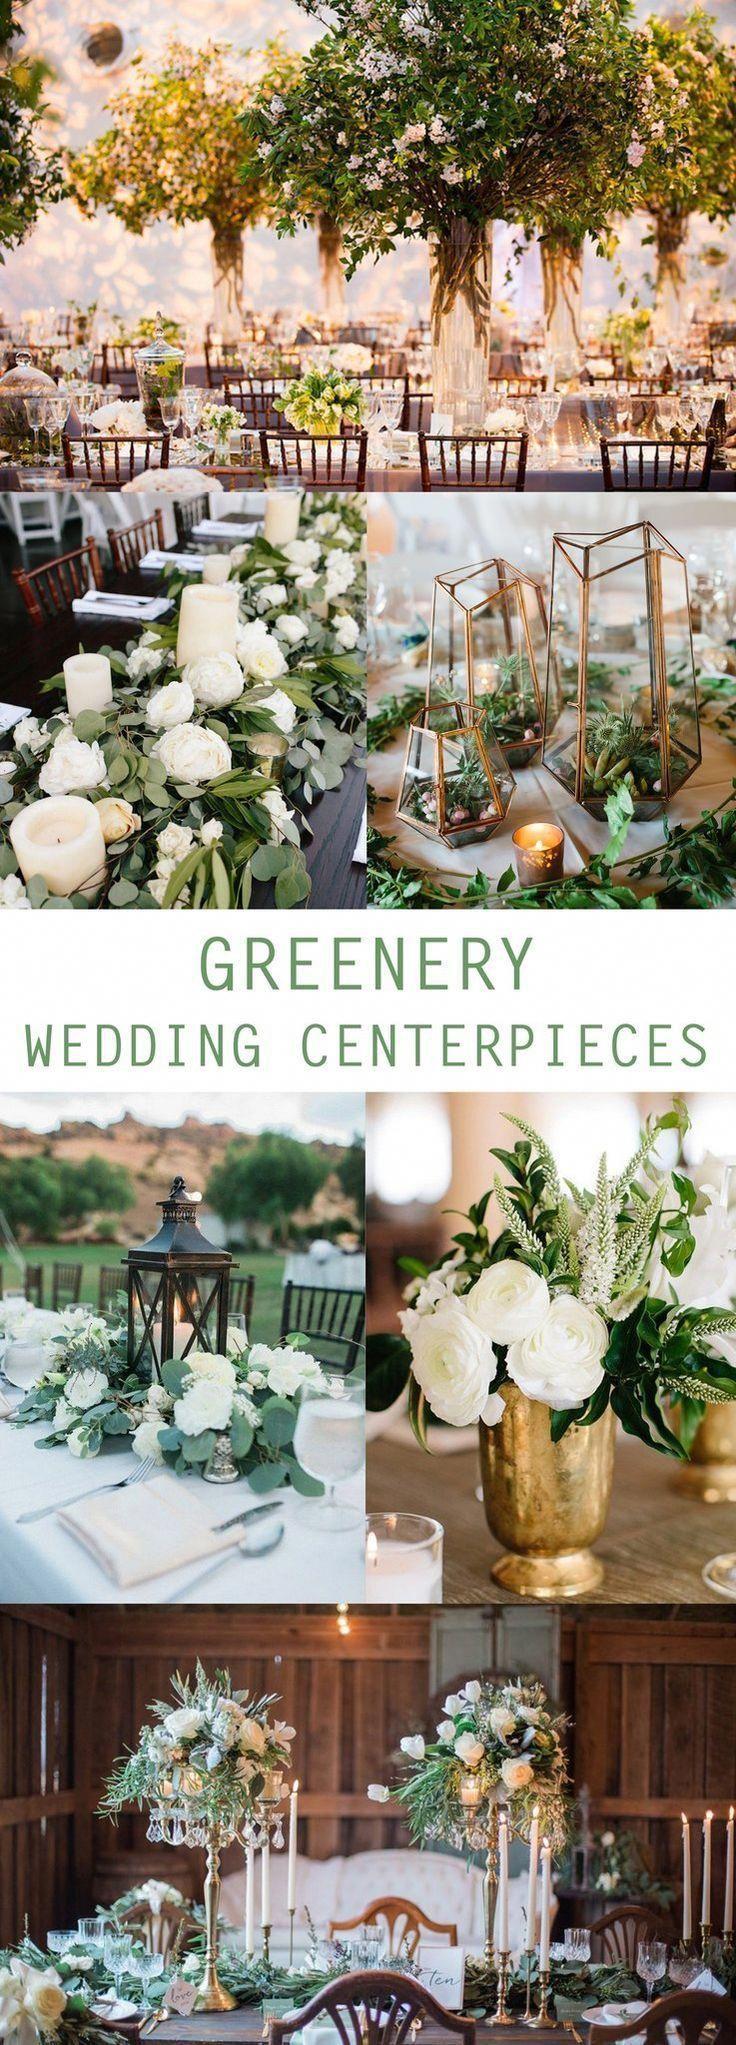 Rewarding slashed classy wedding centerpieces Private Access Rewarding slashed classy wedding cente